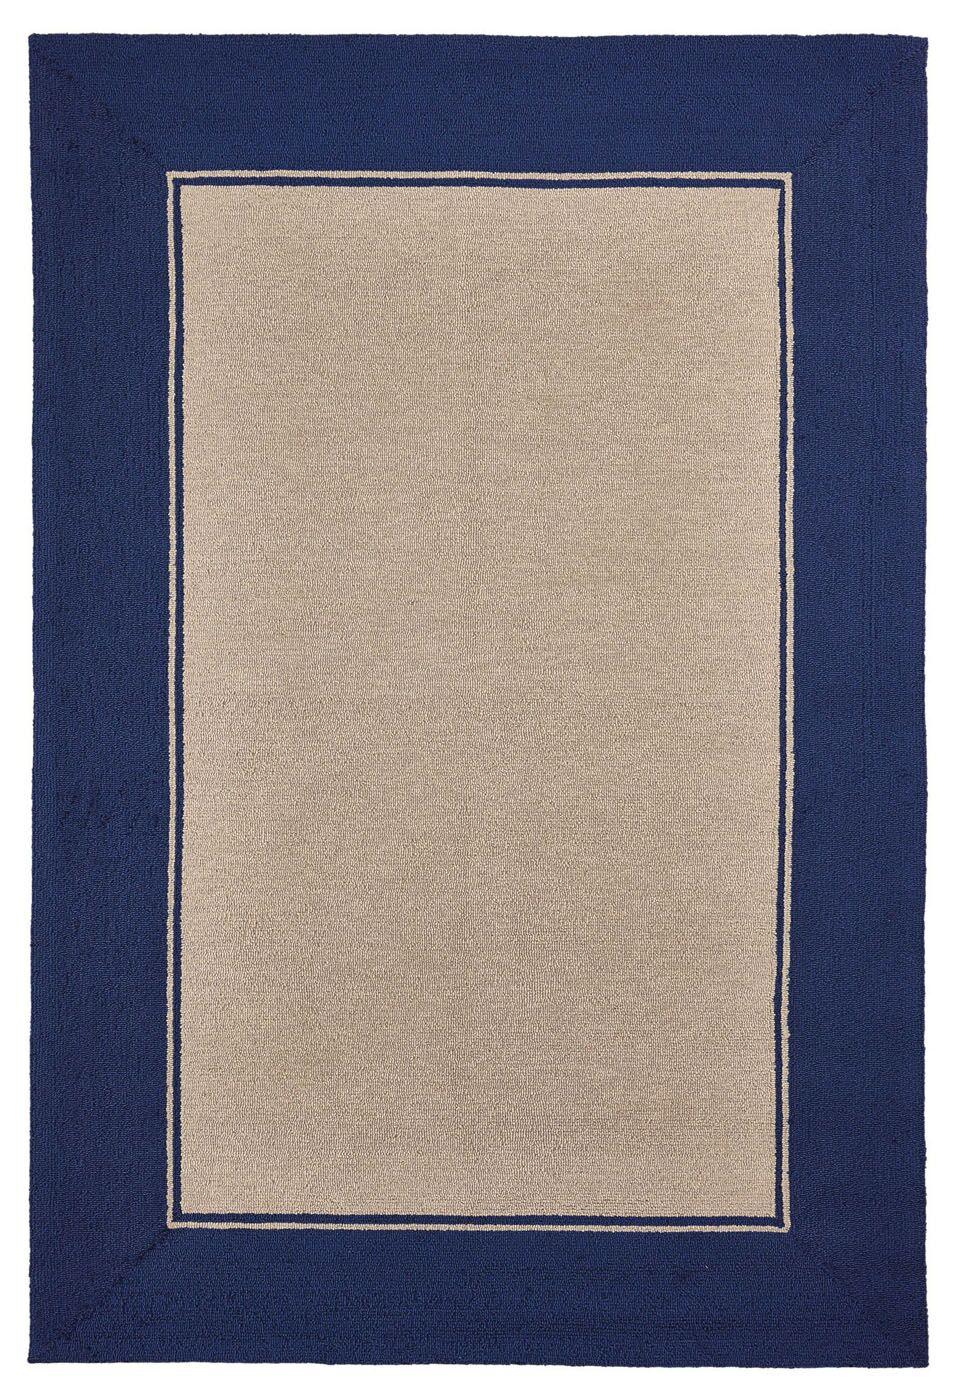 Elam Border Hand-Woven Blue/Beige Indoor/Outdoor Area Rug Rug Size: Rectangle 7'5